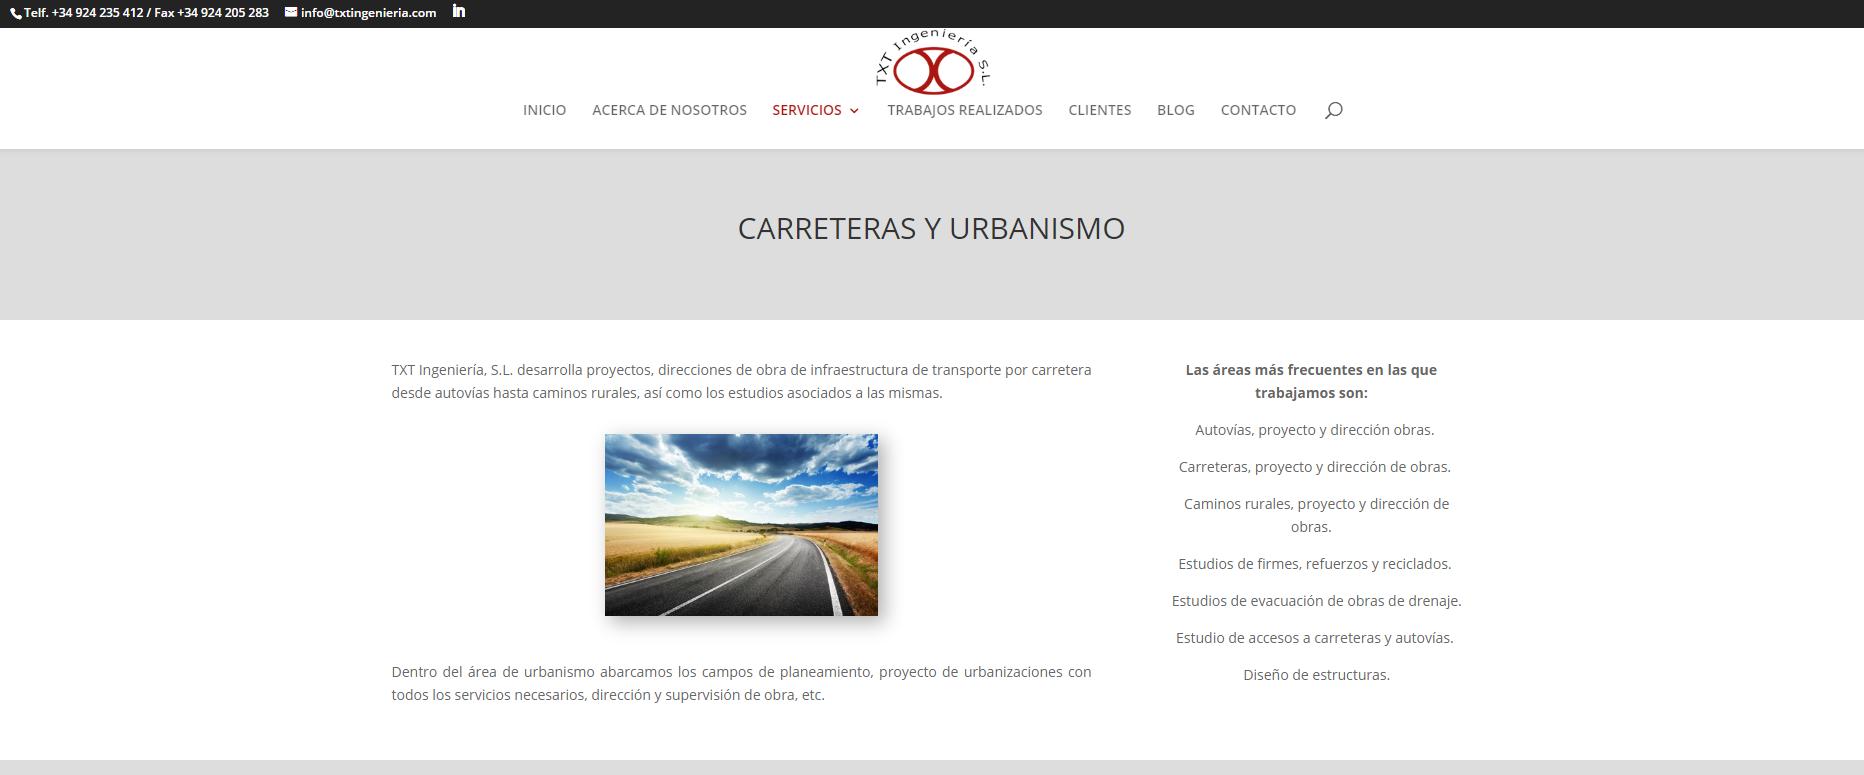 home txt para error anchors divi blog ancho funcionando a carreteras